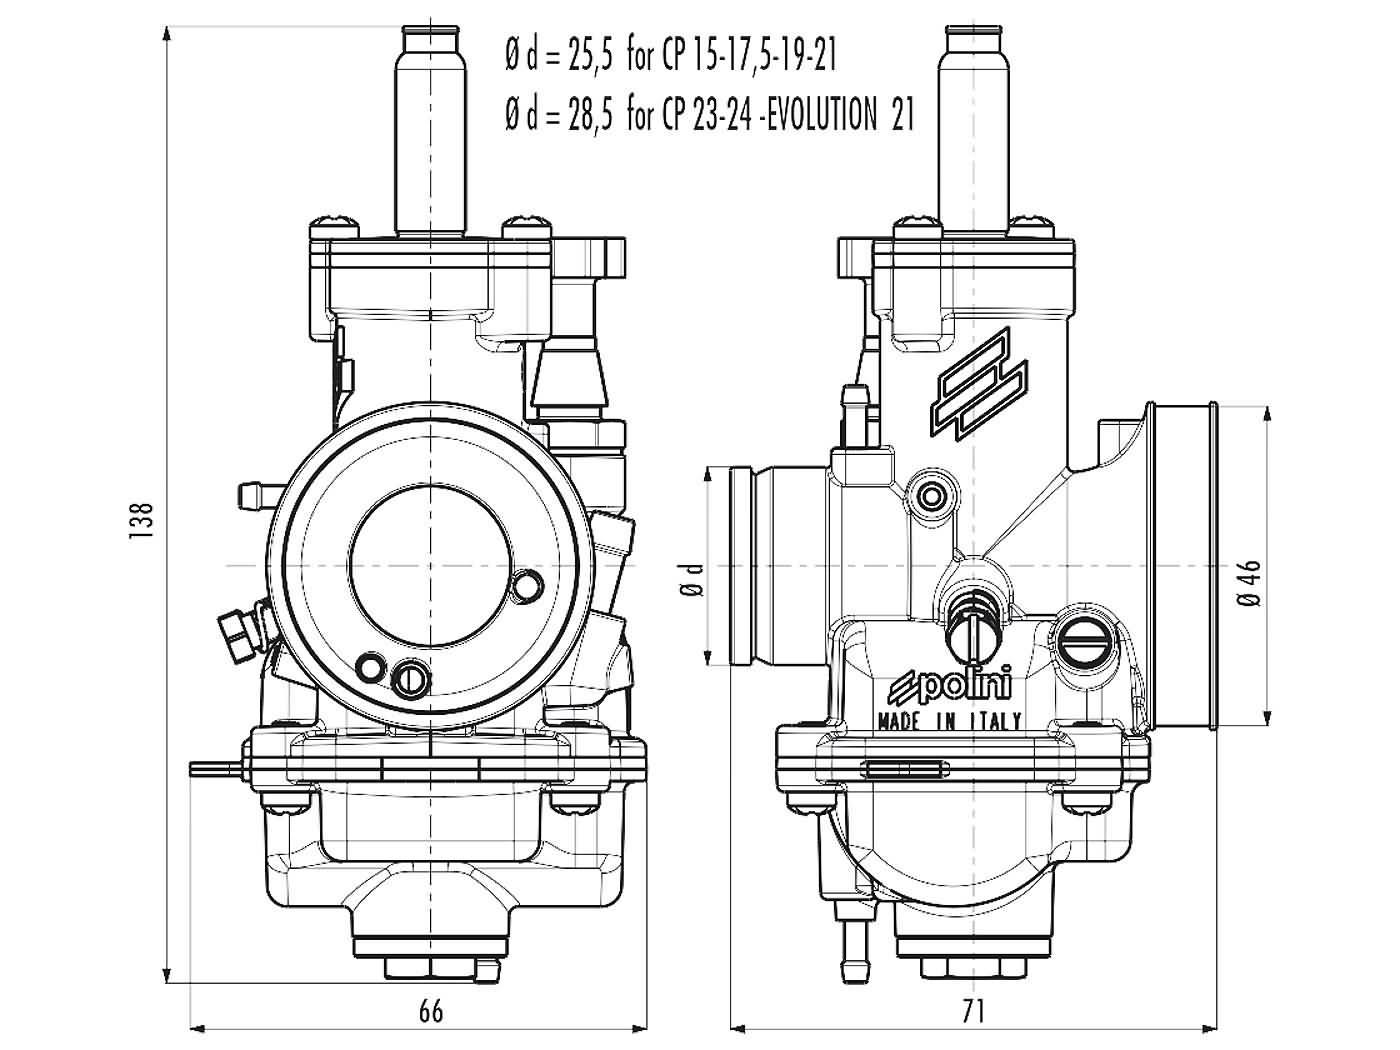 carburetor Polini CP D 23 23mm knob choke | Scooter Parts